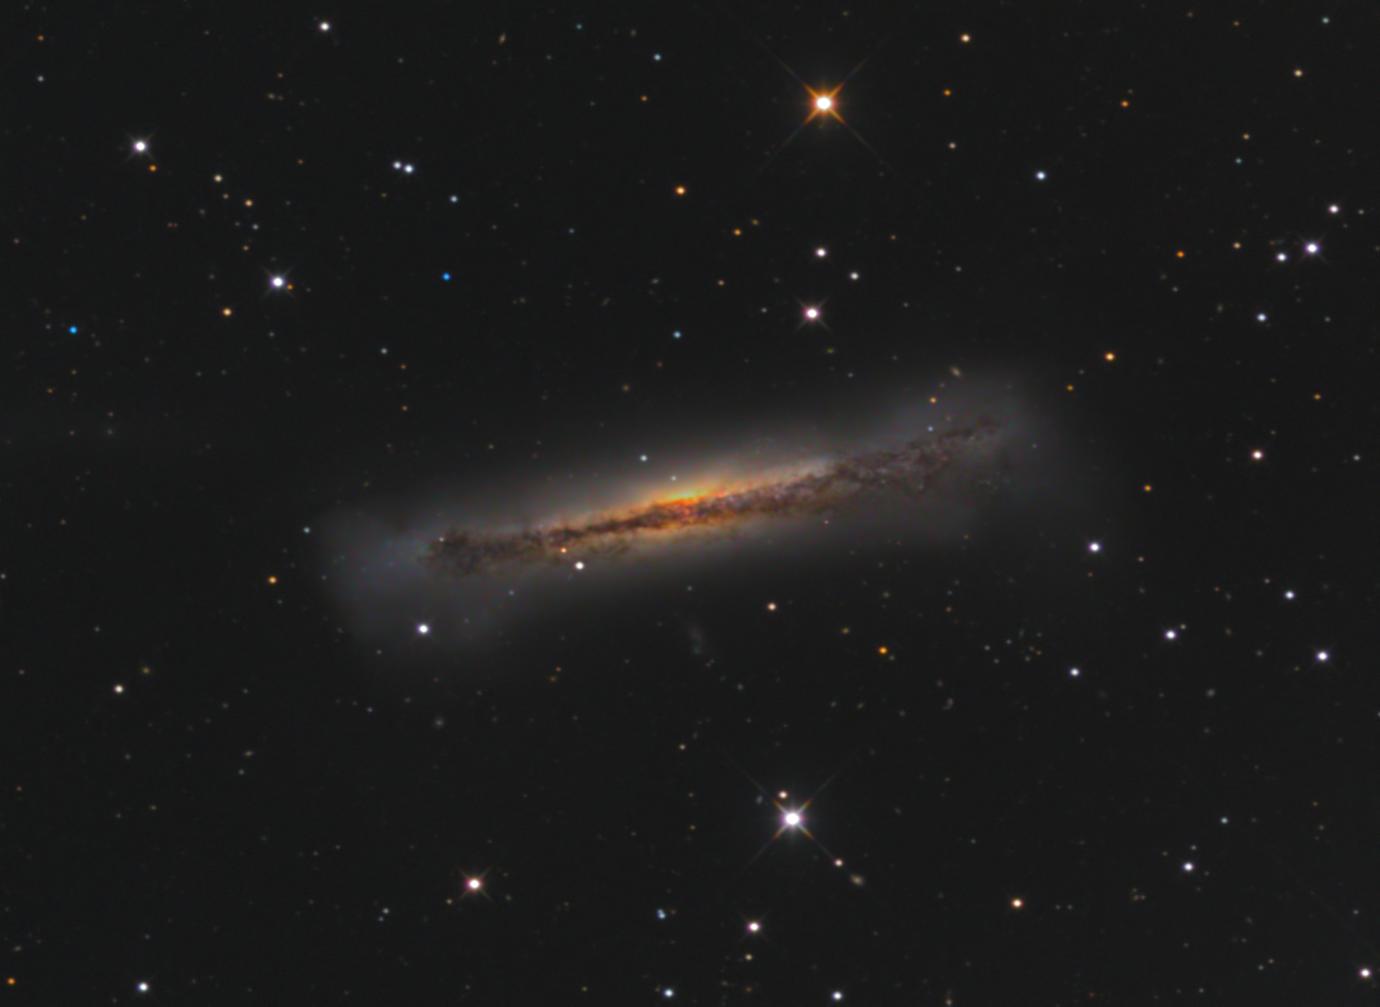 5ad5296e5679f_NGC3628.png.f59a8d061b76b486f7f6240de5a9c376.png